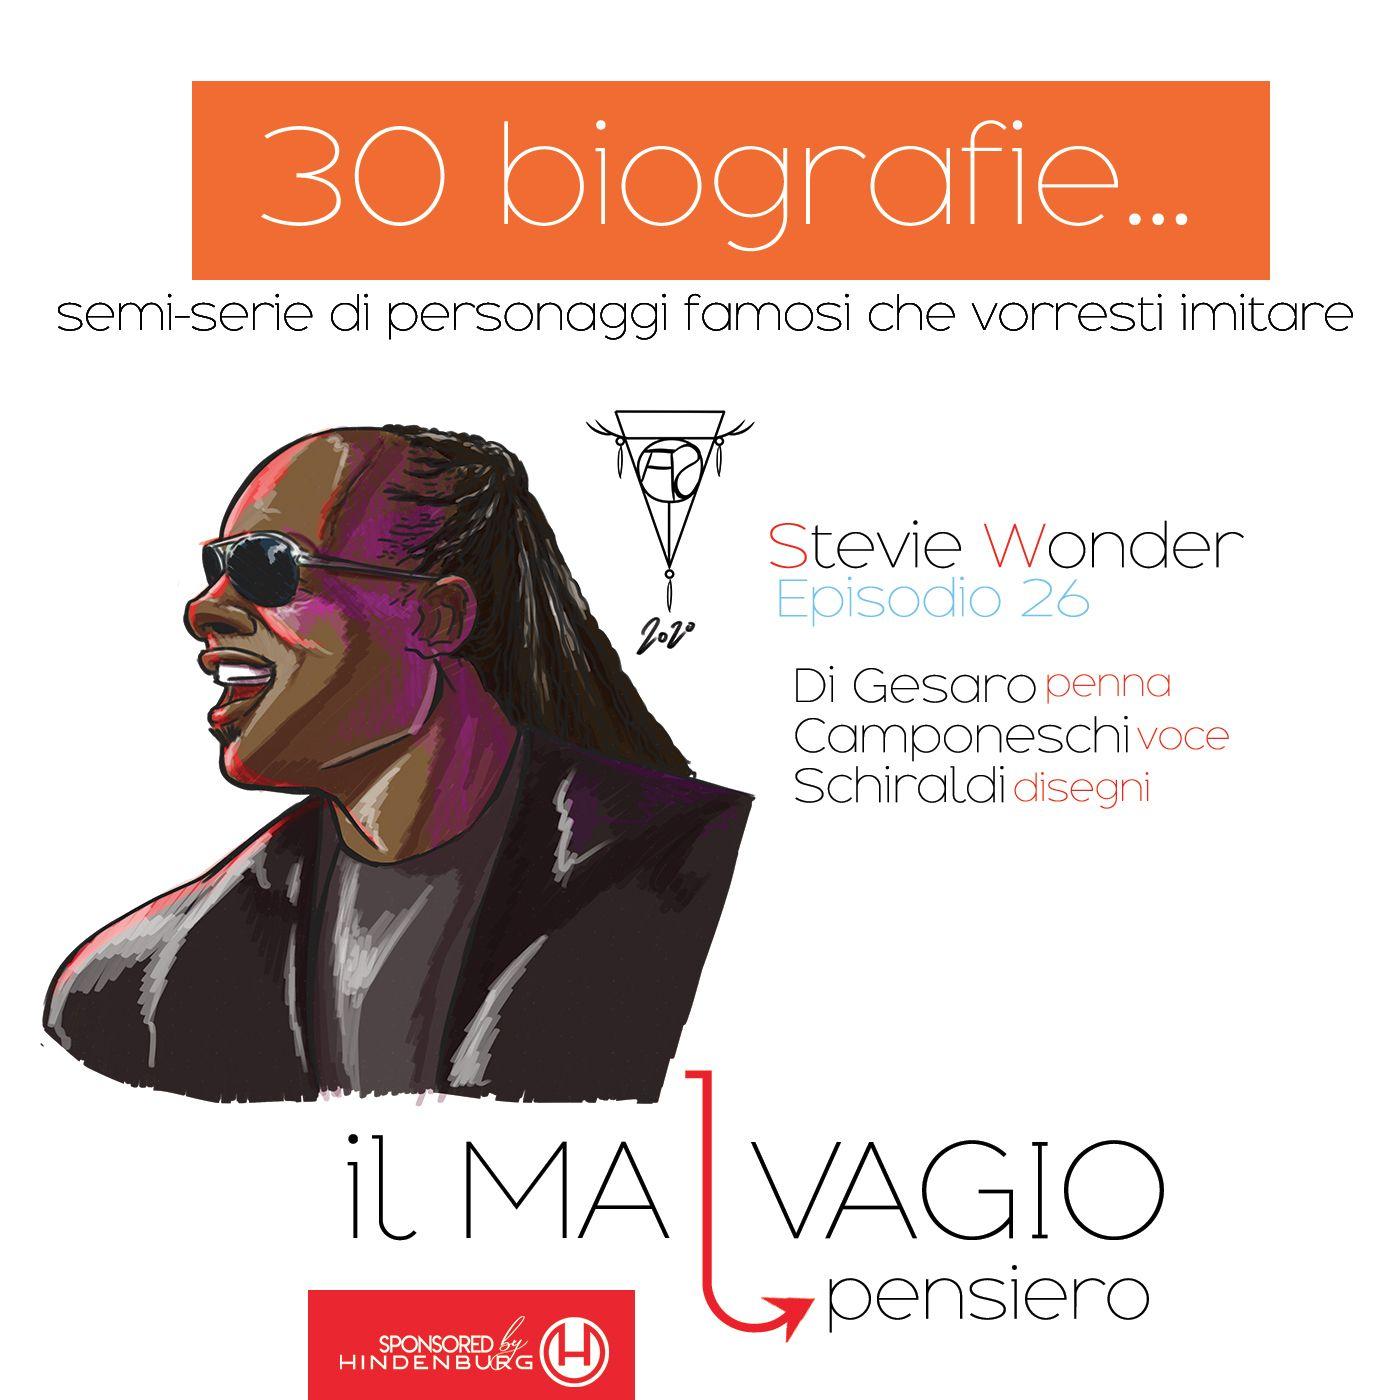 26 - Stevie Wonder: il Re del peperoncino